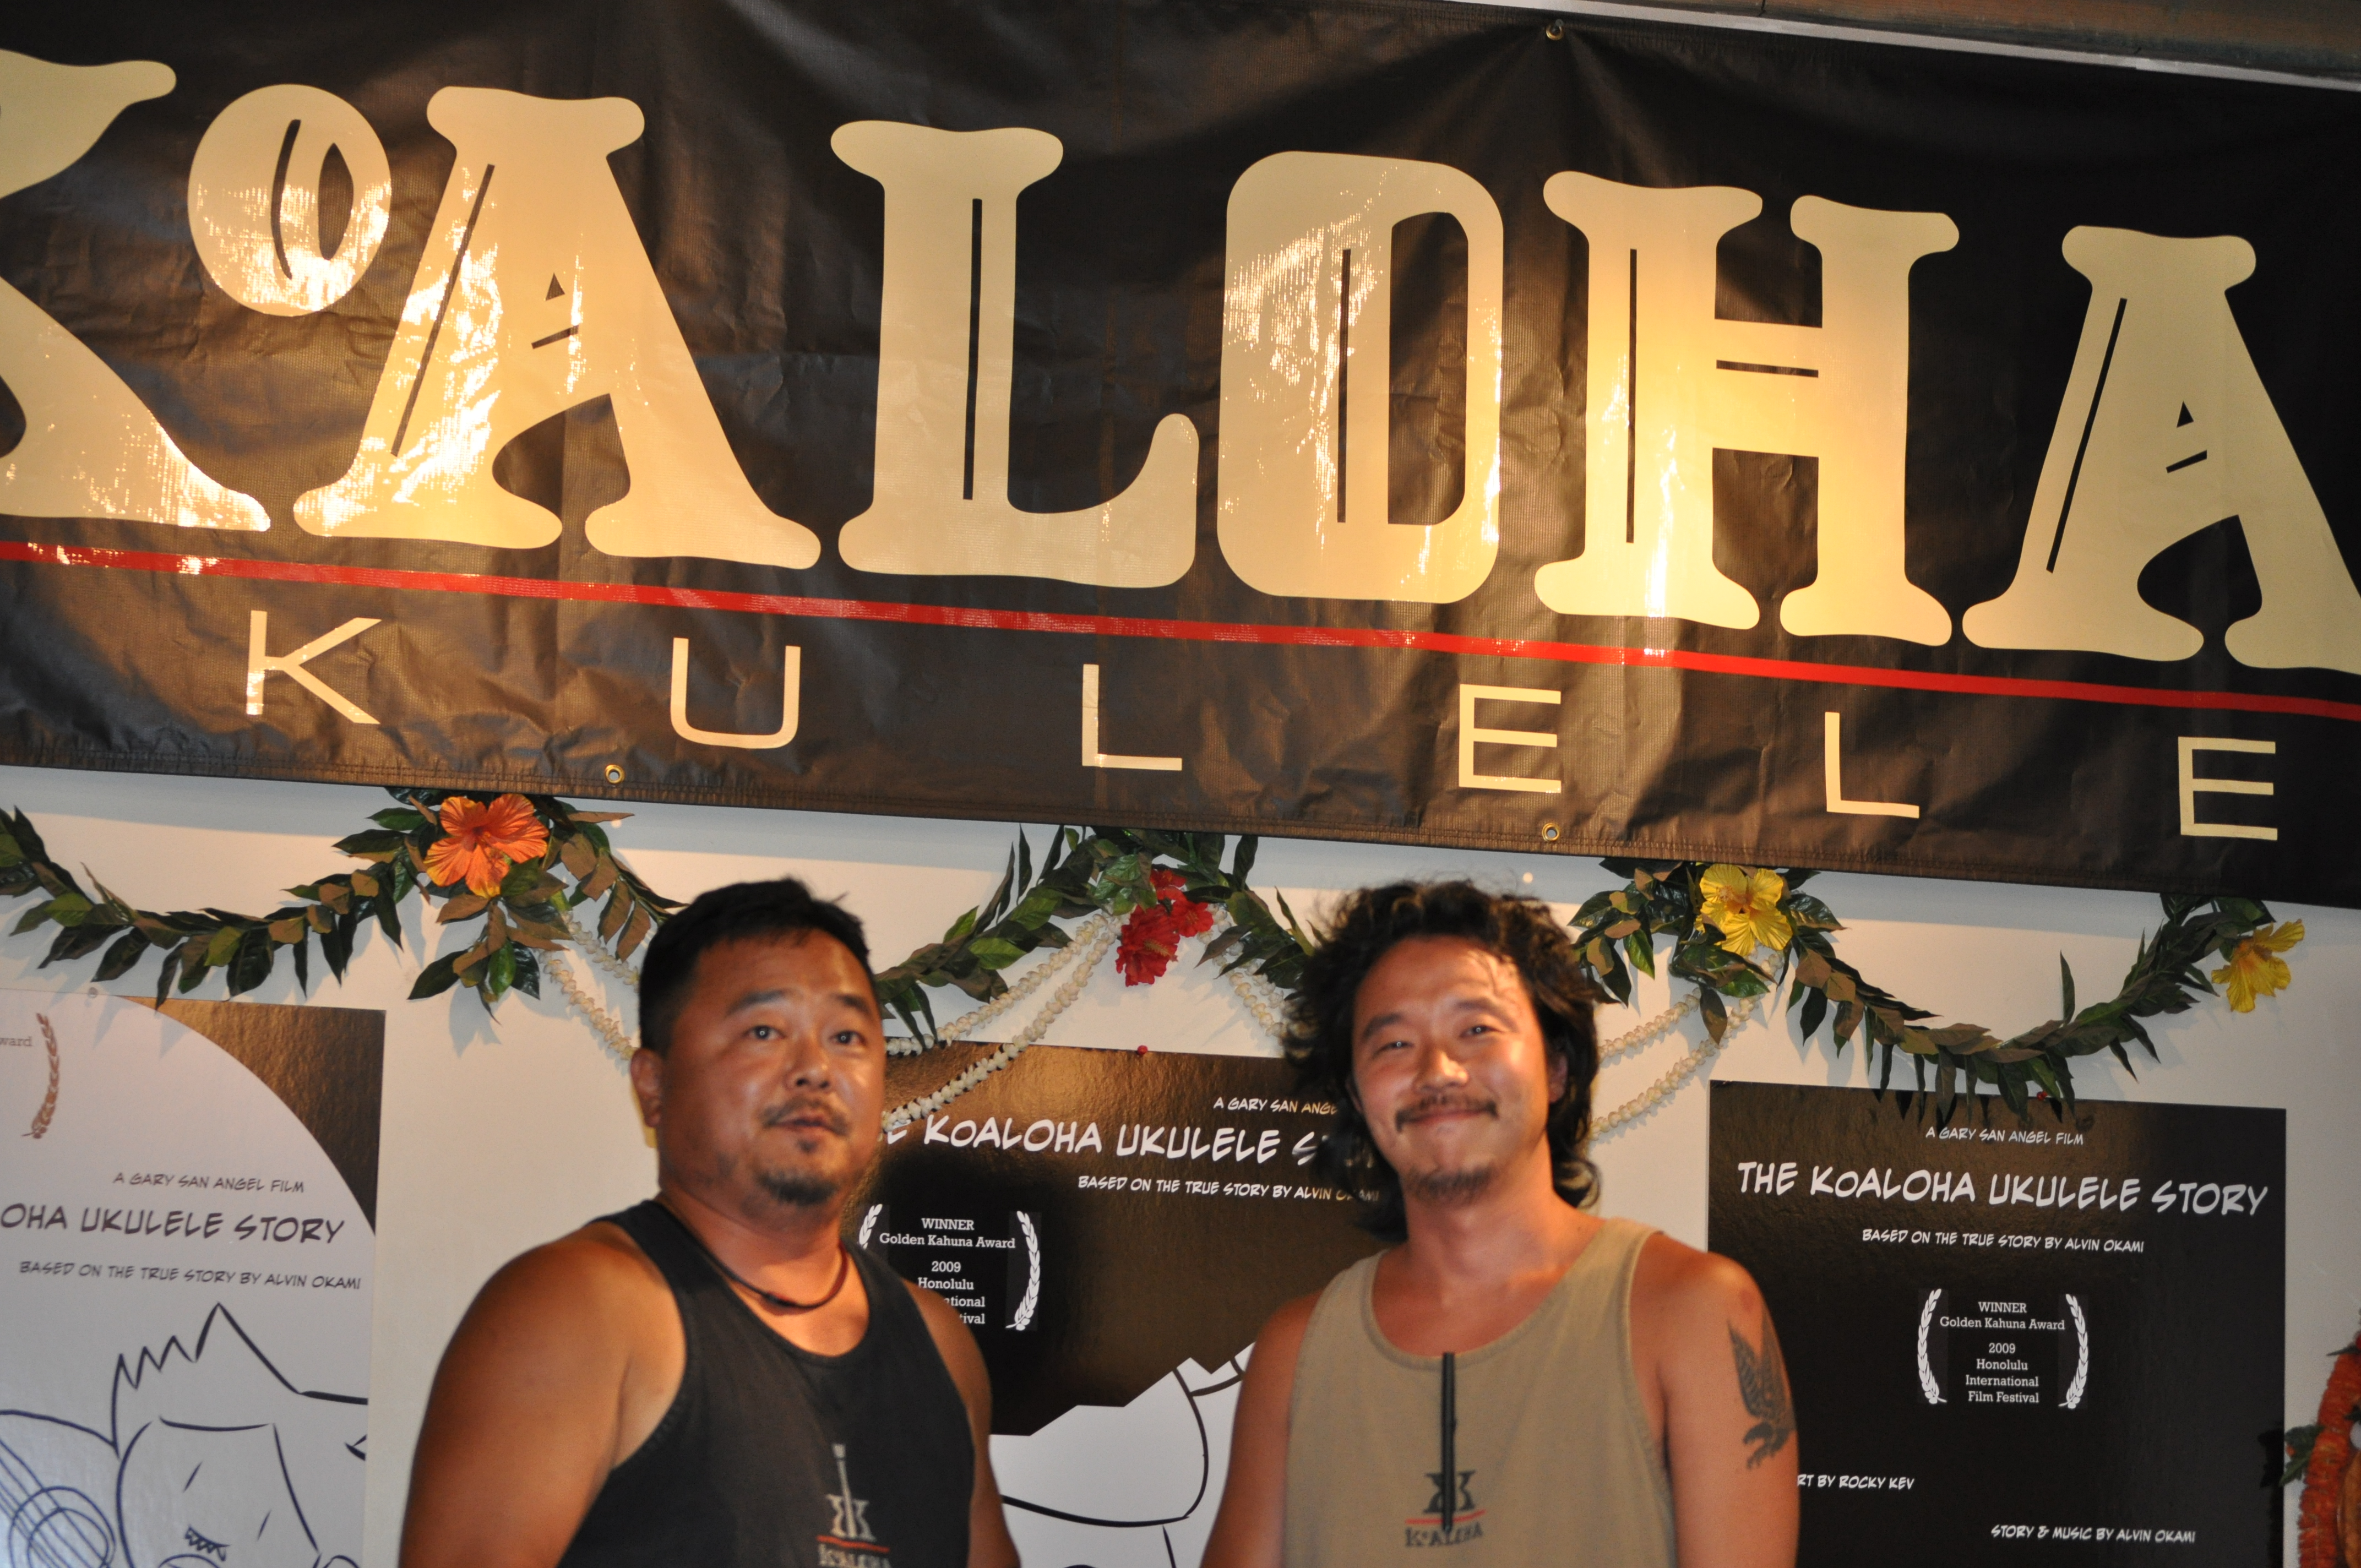 KoAloha Mai – Guests: Ken Yuen (@bayviewminiputt) and Lori Okami (@bstronglivelong)  – Episode 1 (3/29/11)